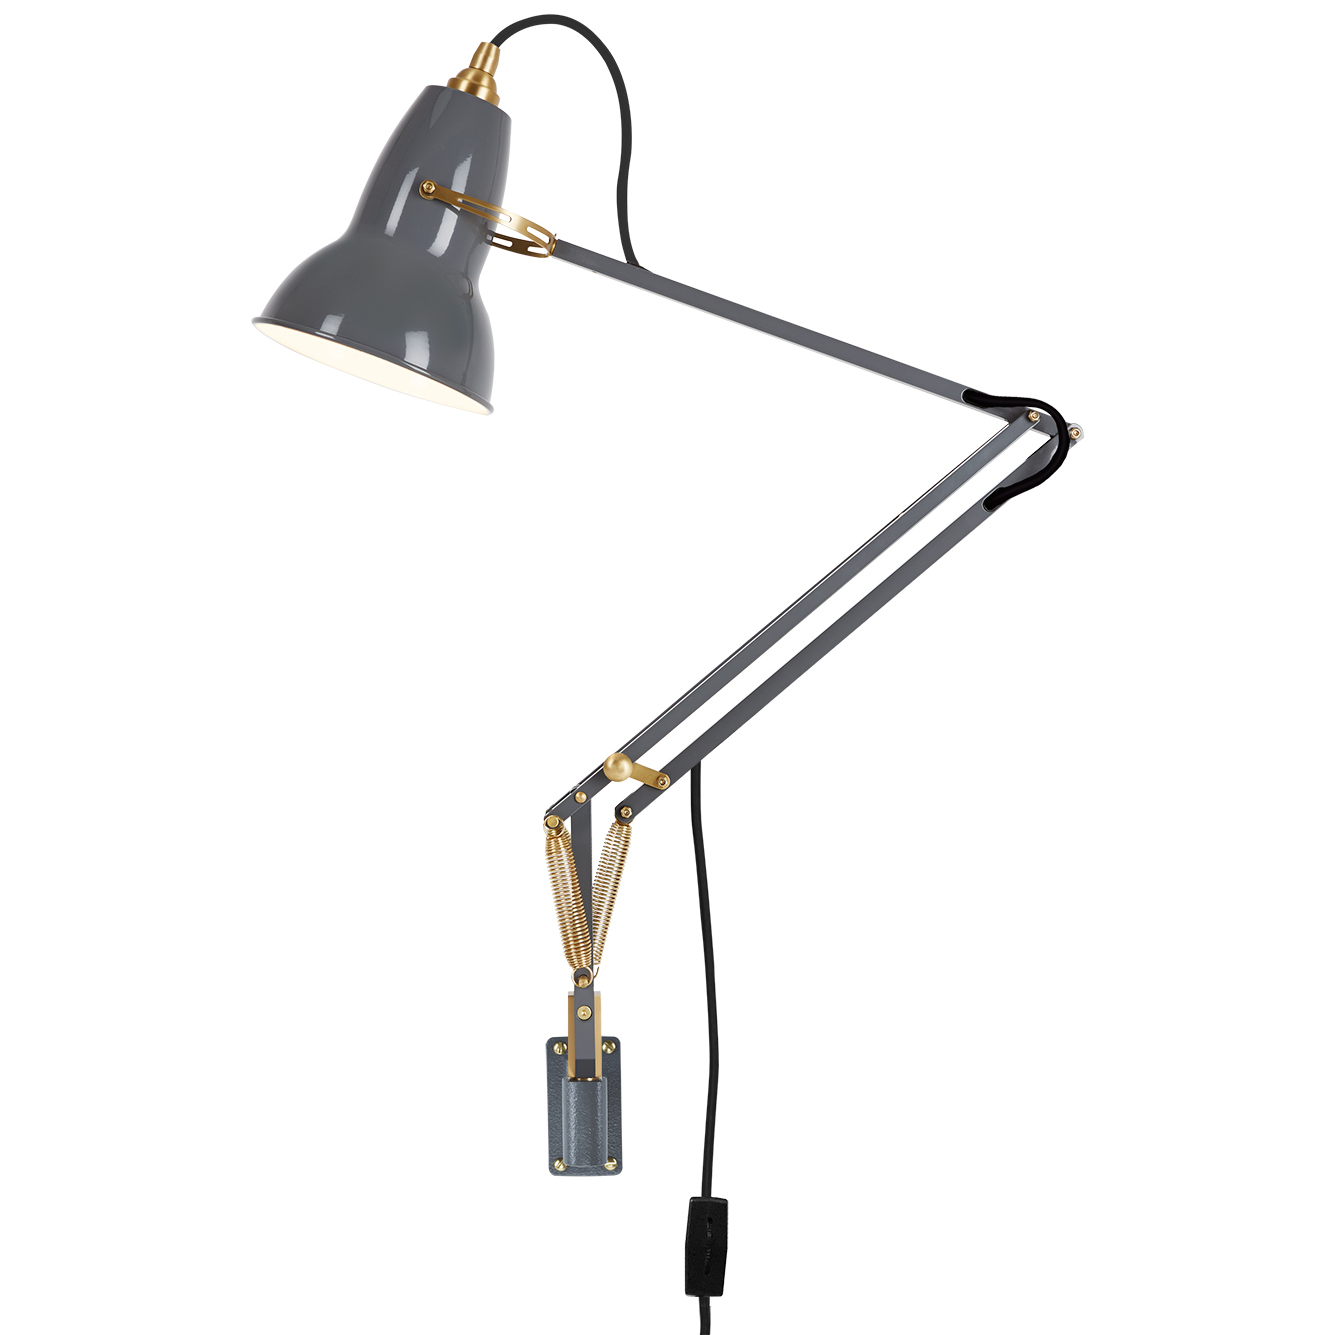 Original 1227 Br Wall Mounted Task Lamp By Anglepoise Ang 31515